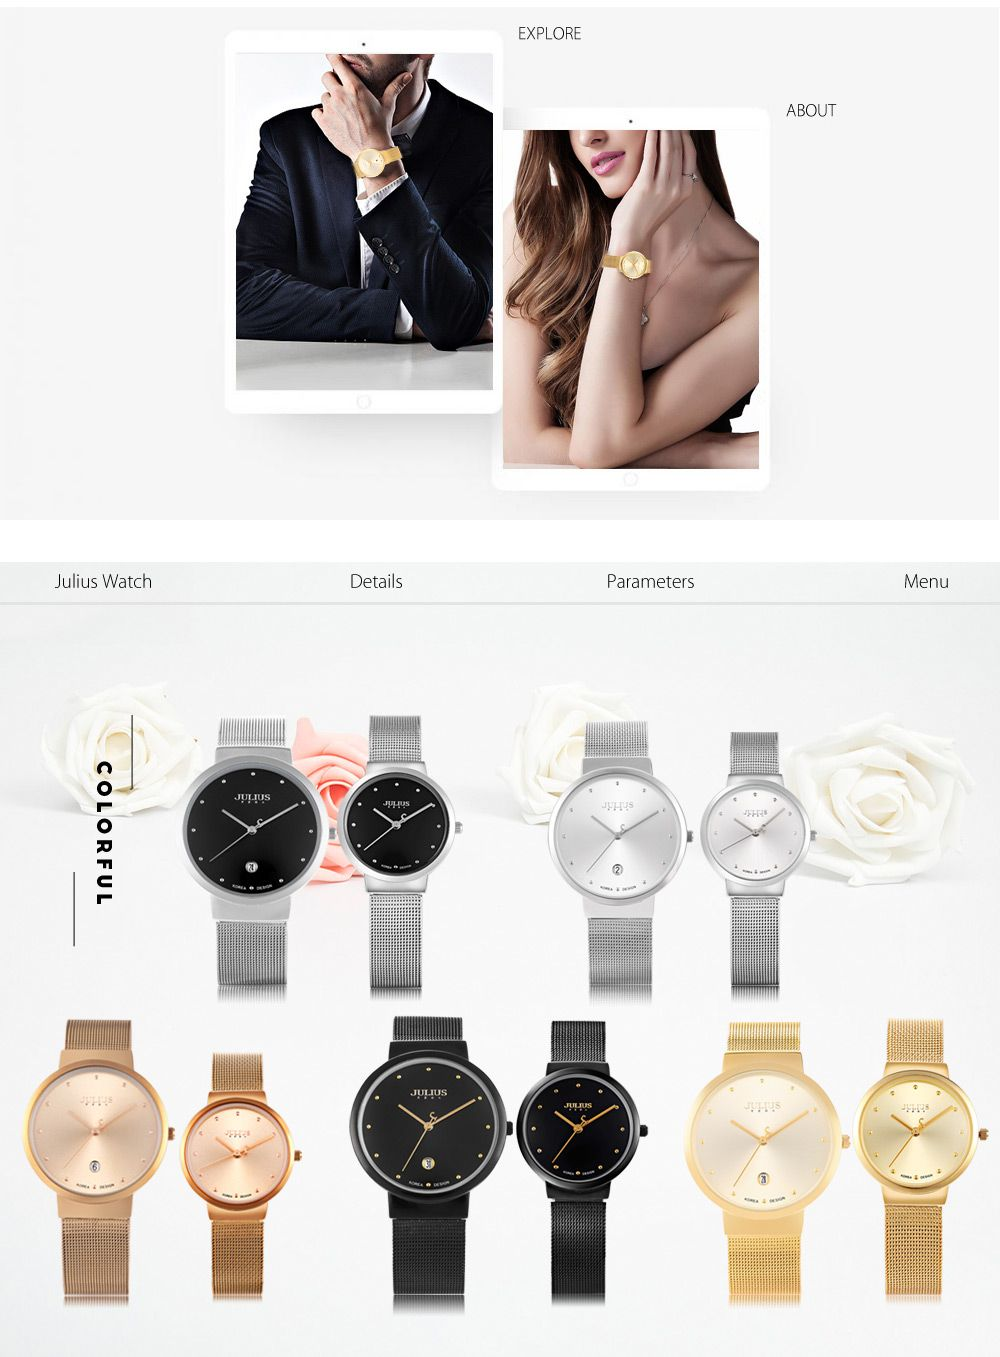 Julius JA - 426 Couple Ultrathin Stainless Steel Mesh Band Quartz Wrist Watch